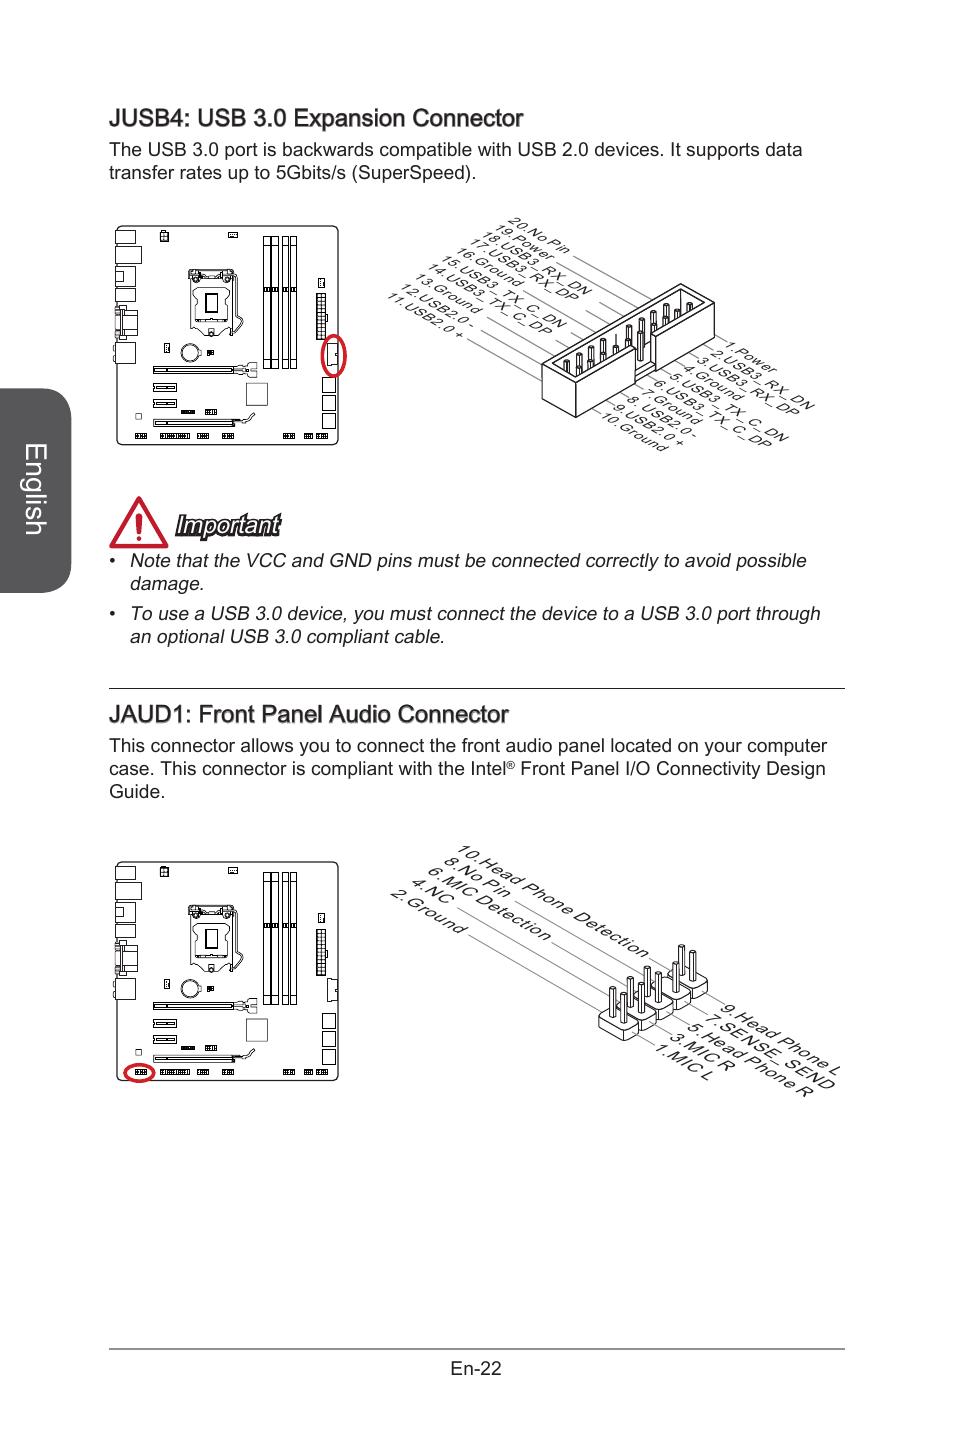 Jaud1, Front panel audio connector, En-22 | MSI B85M-G43 User Manual